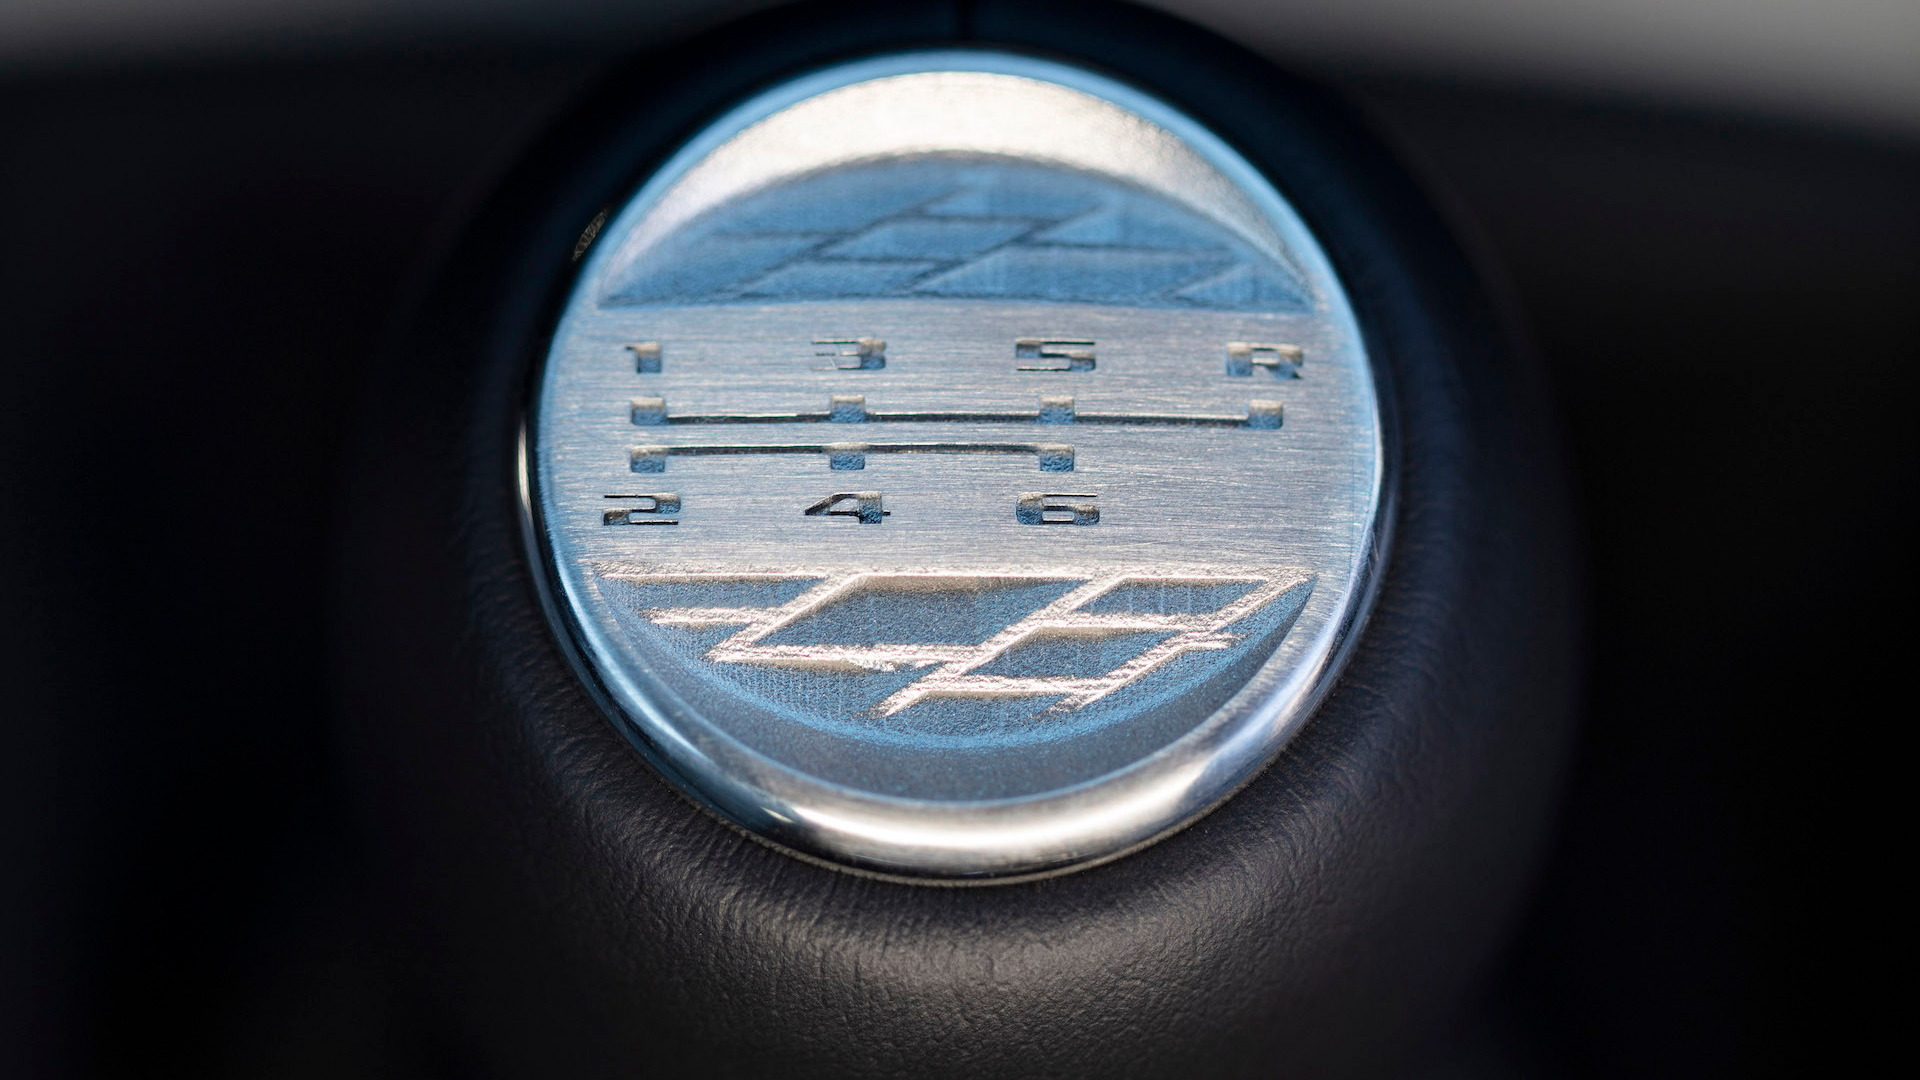 2022 Cadillac CT4-V Blackwing and CT5-V Blackwing manual transmission